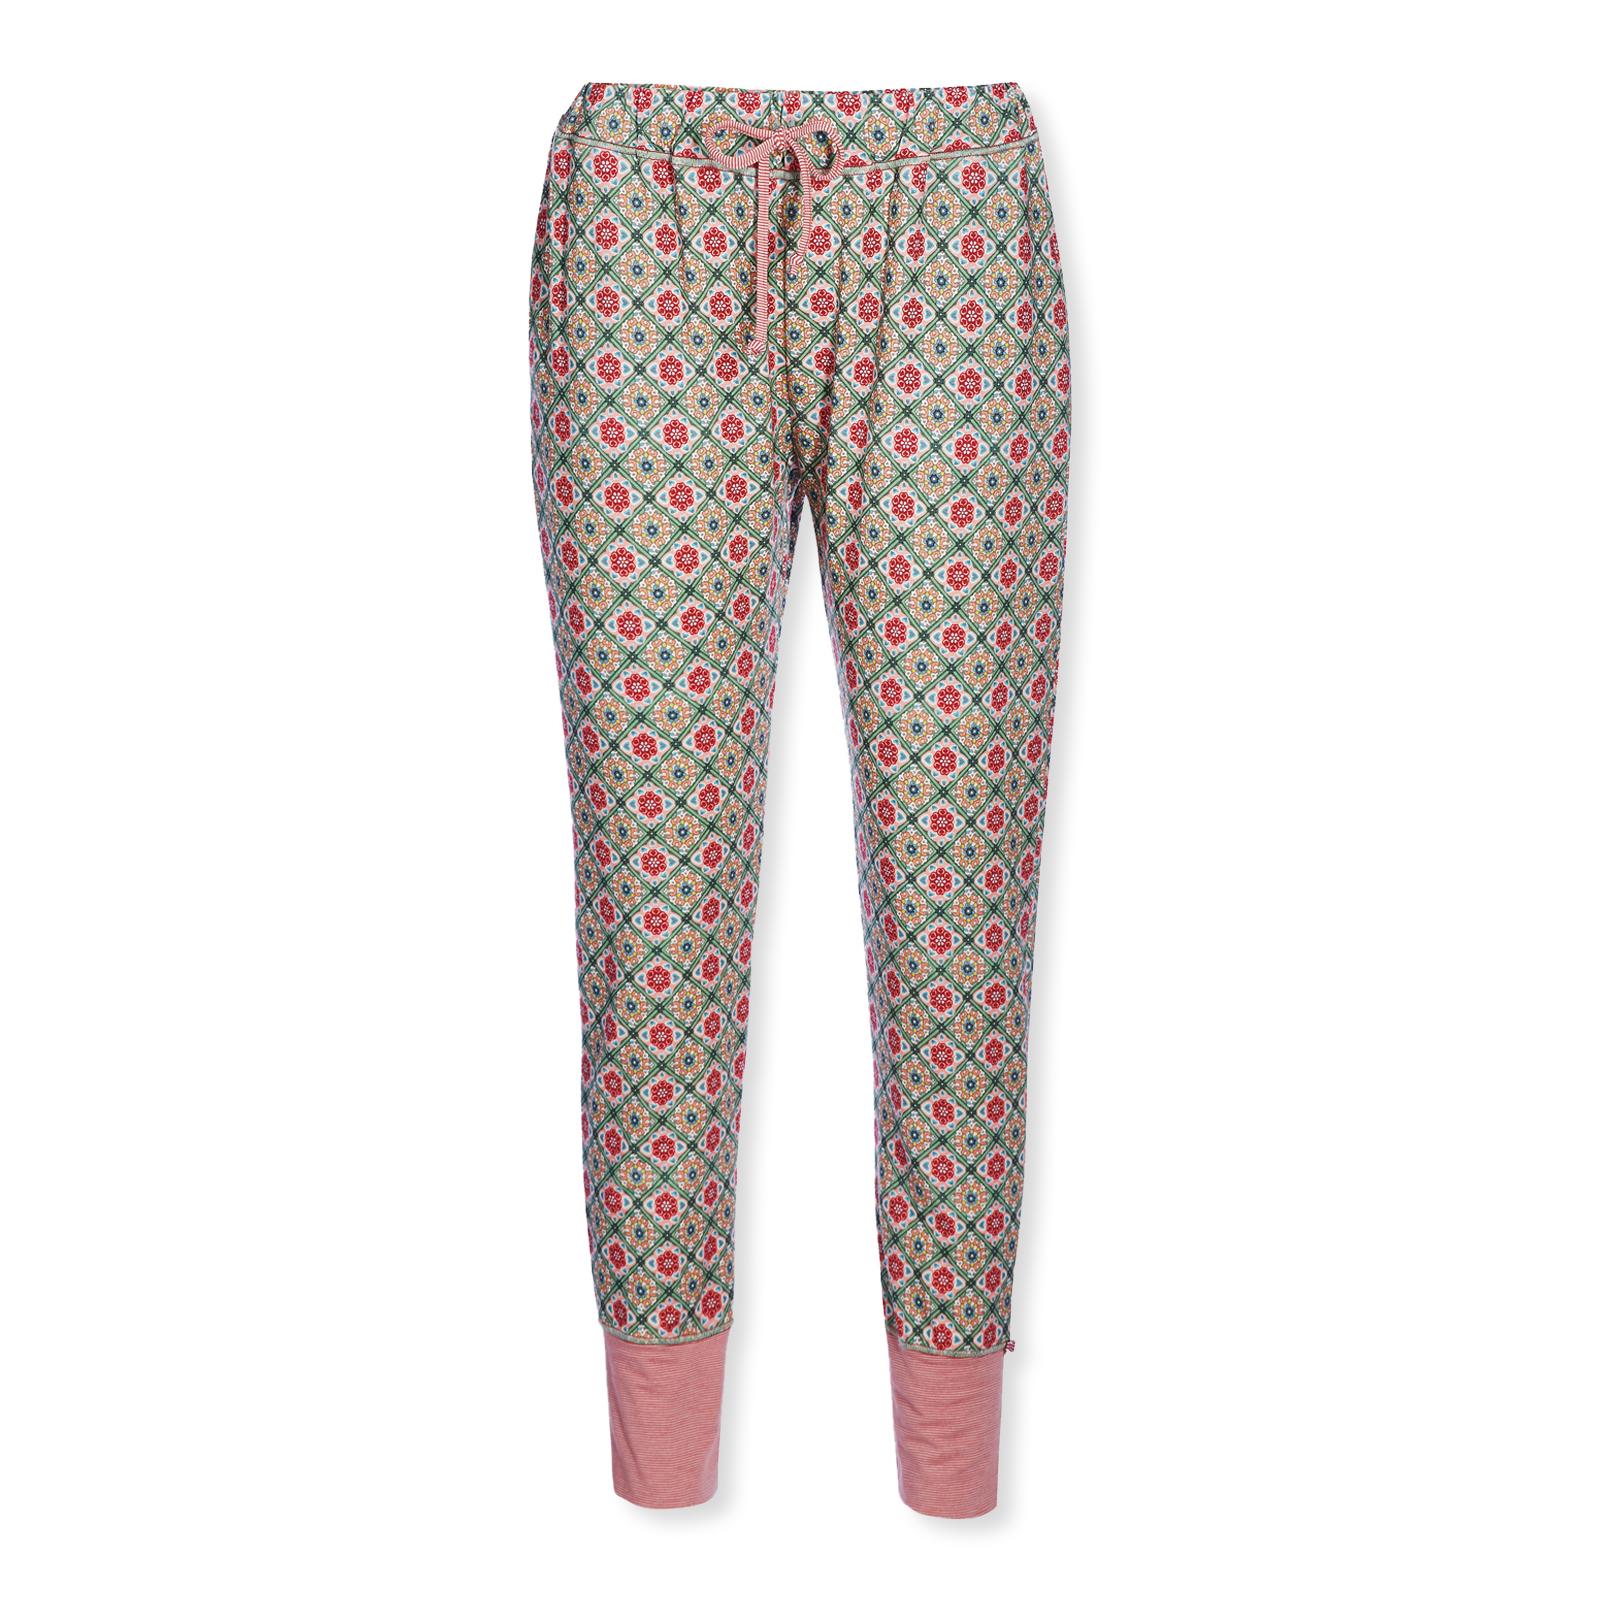 PiP Studio Damen Pyjamahose lang Bobien Double Check 260601 in pink